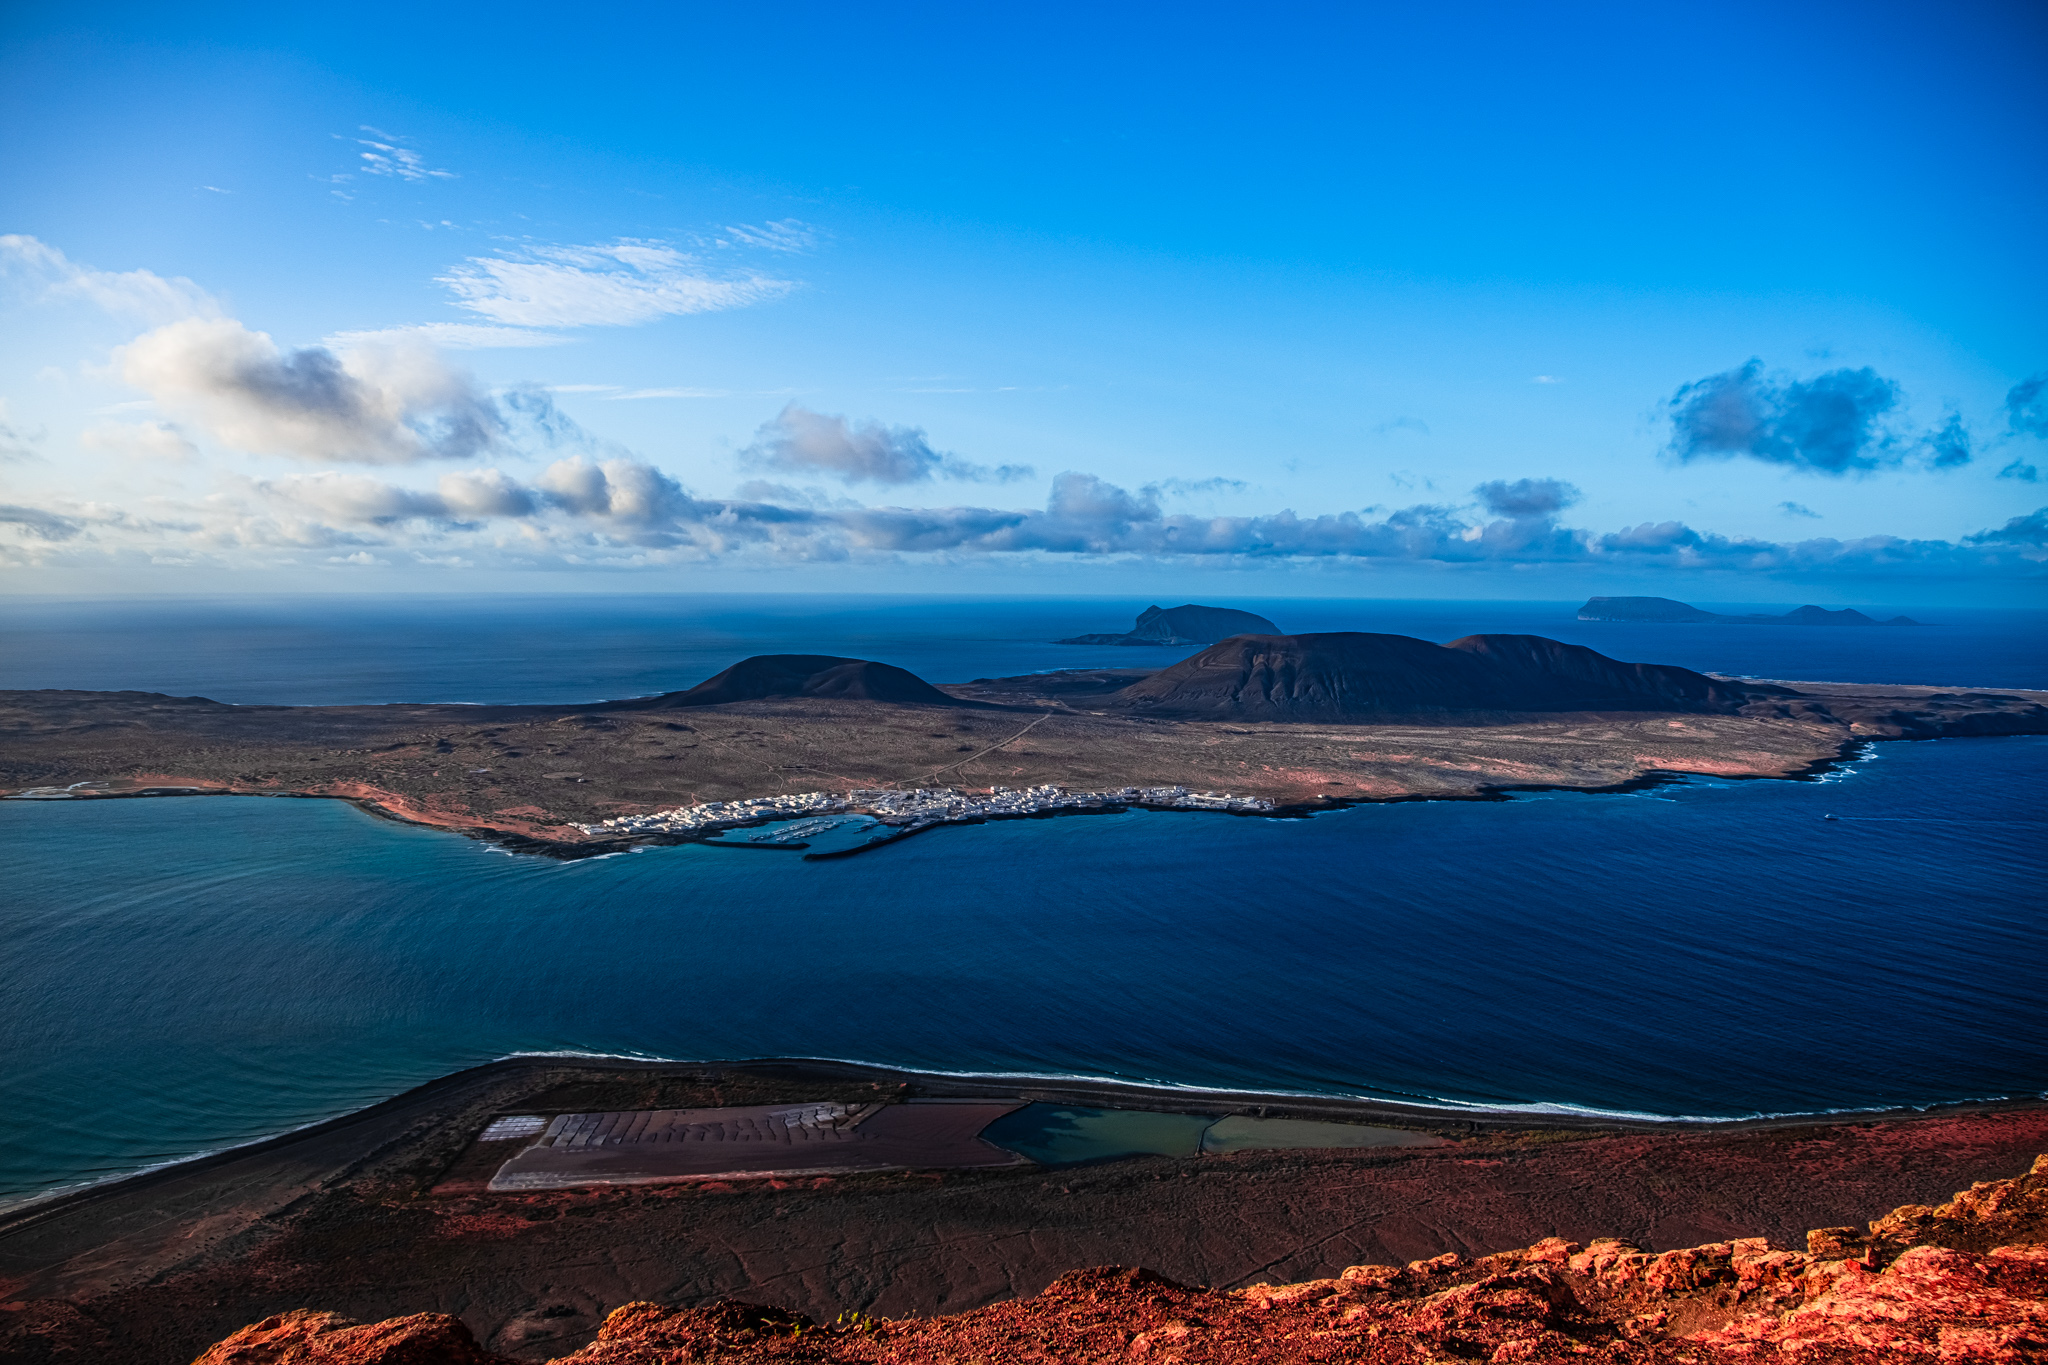 Isole Canarie: quale isola scegliere.